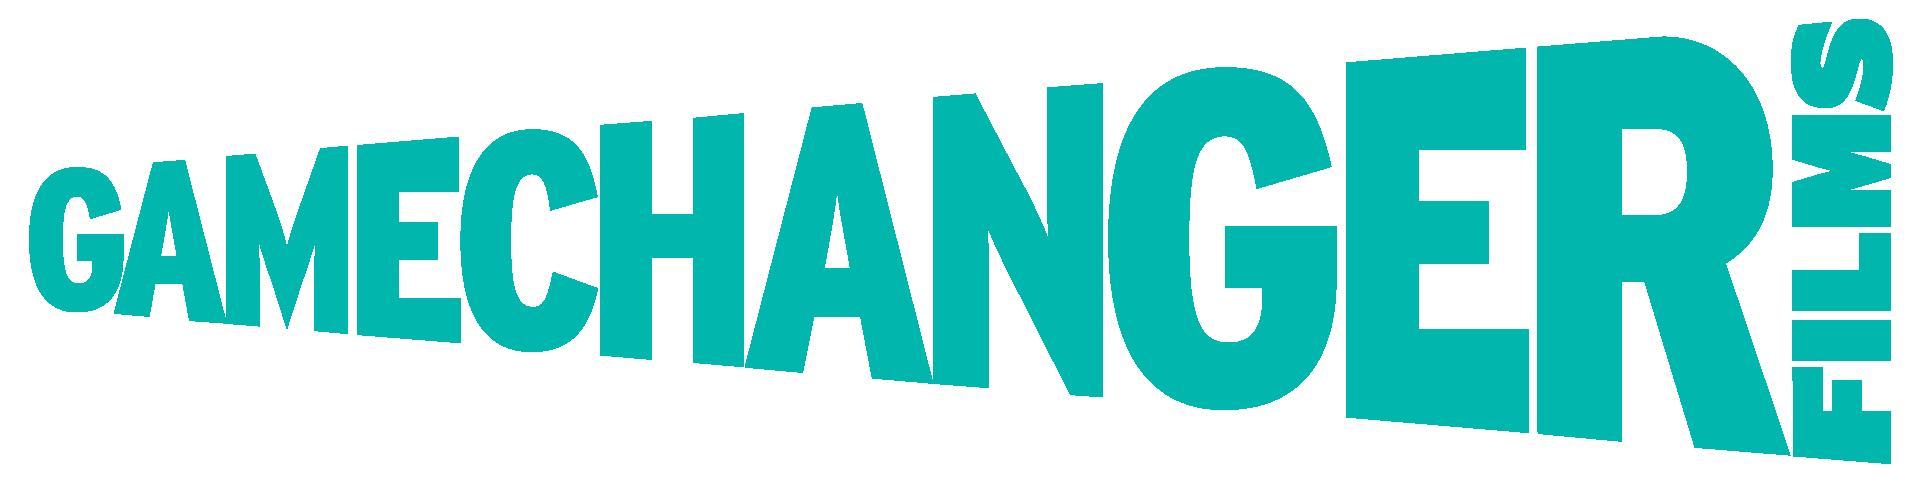 Branding_GamechangerFilms.png